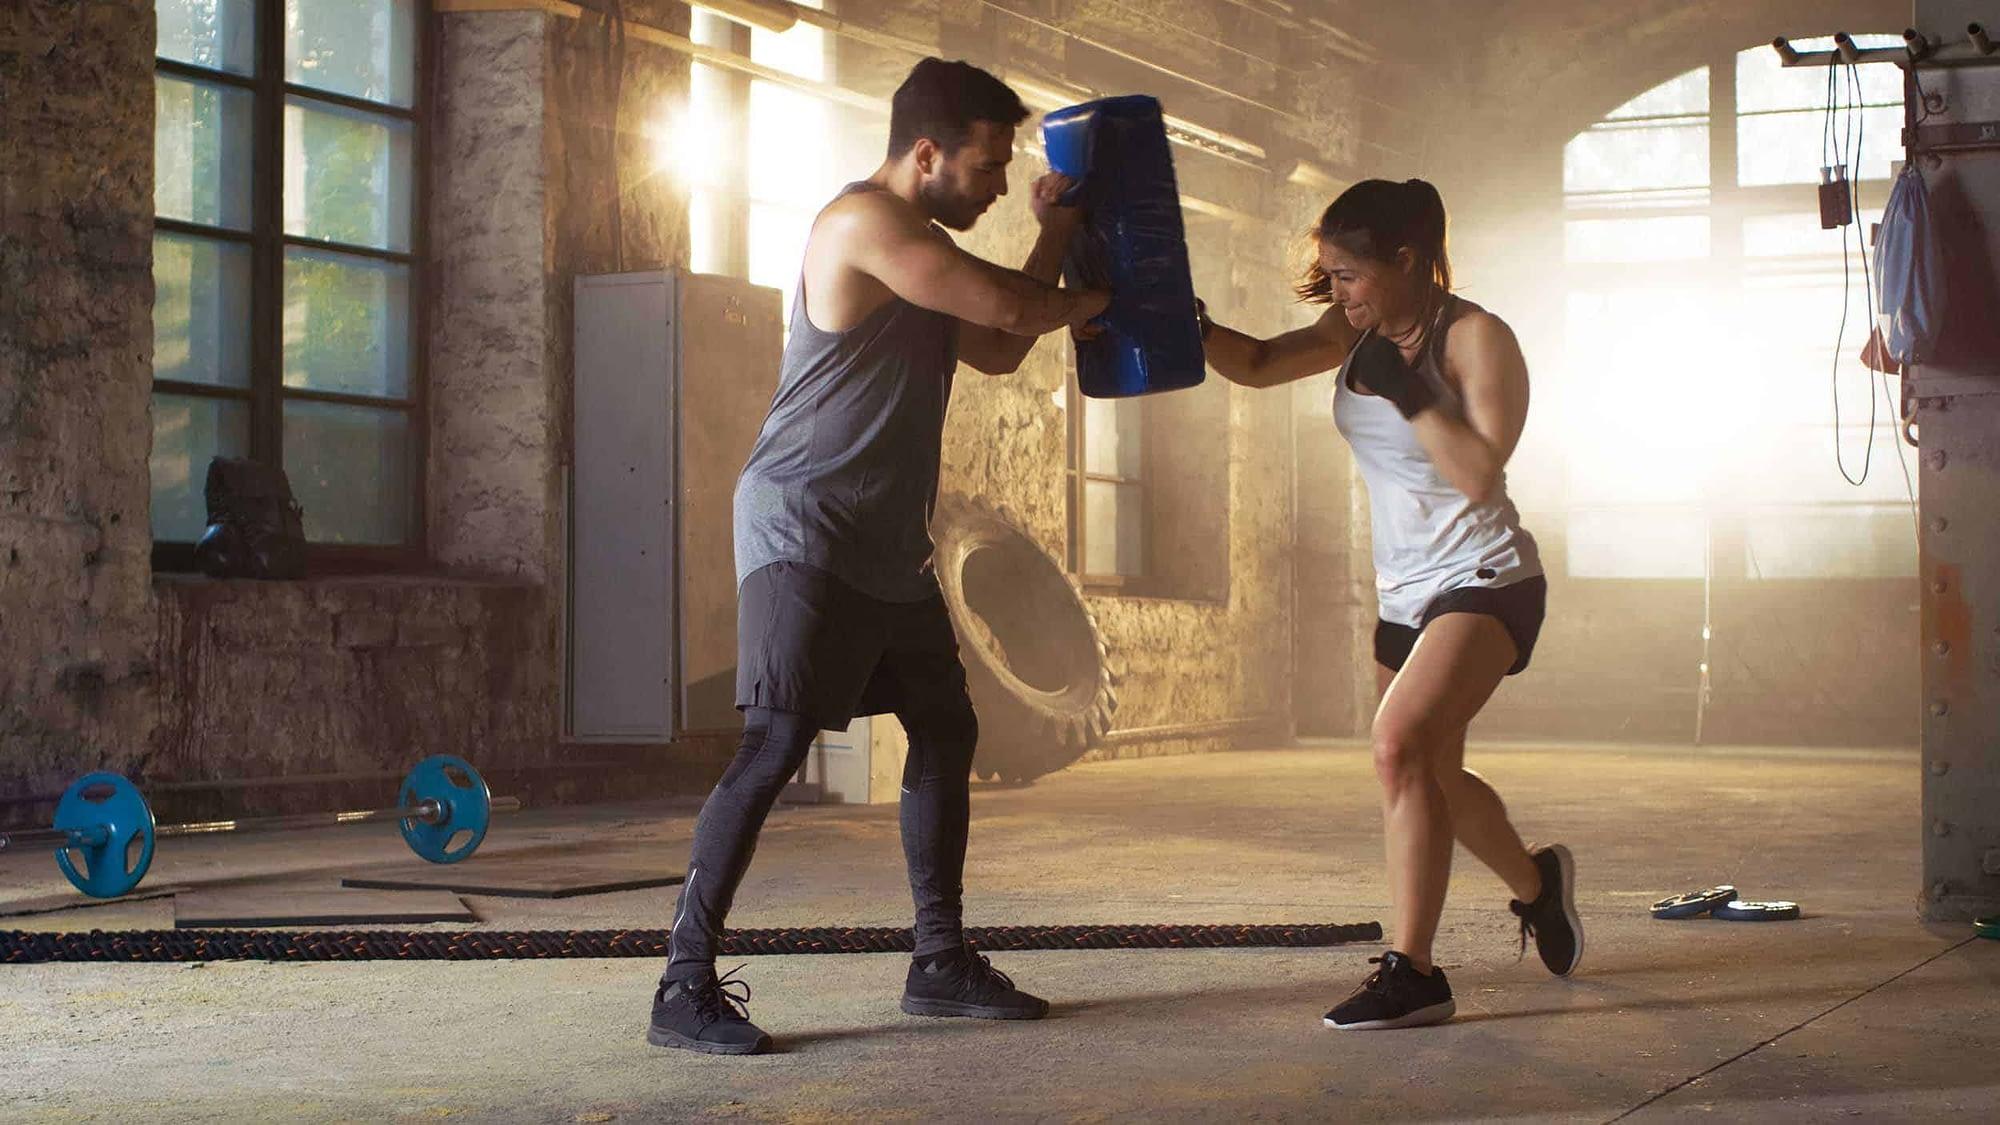 Boksen Eindhoven Essink fitness boksschool boks boksfit